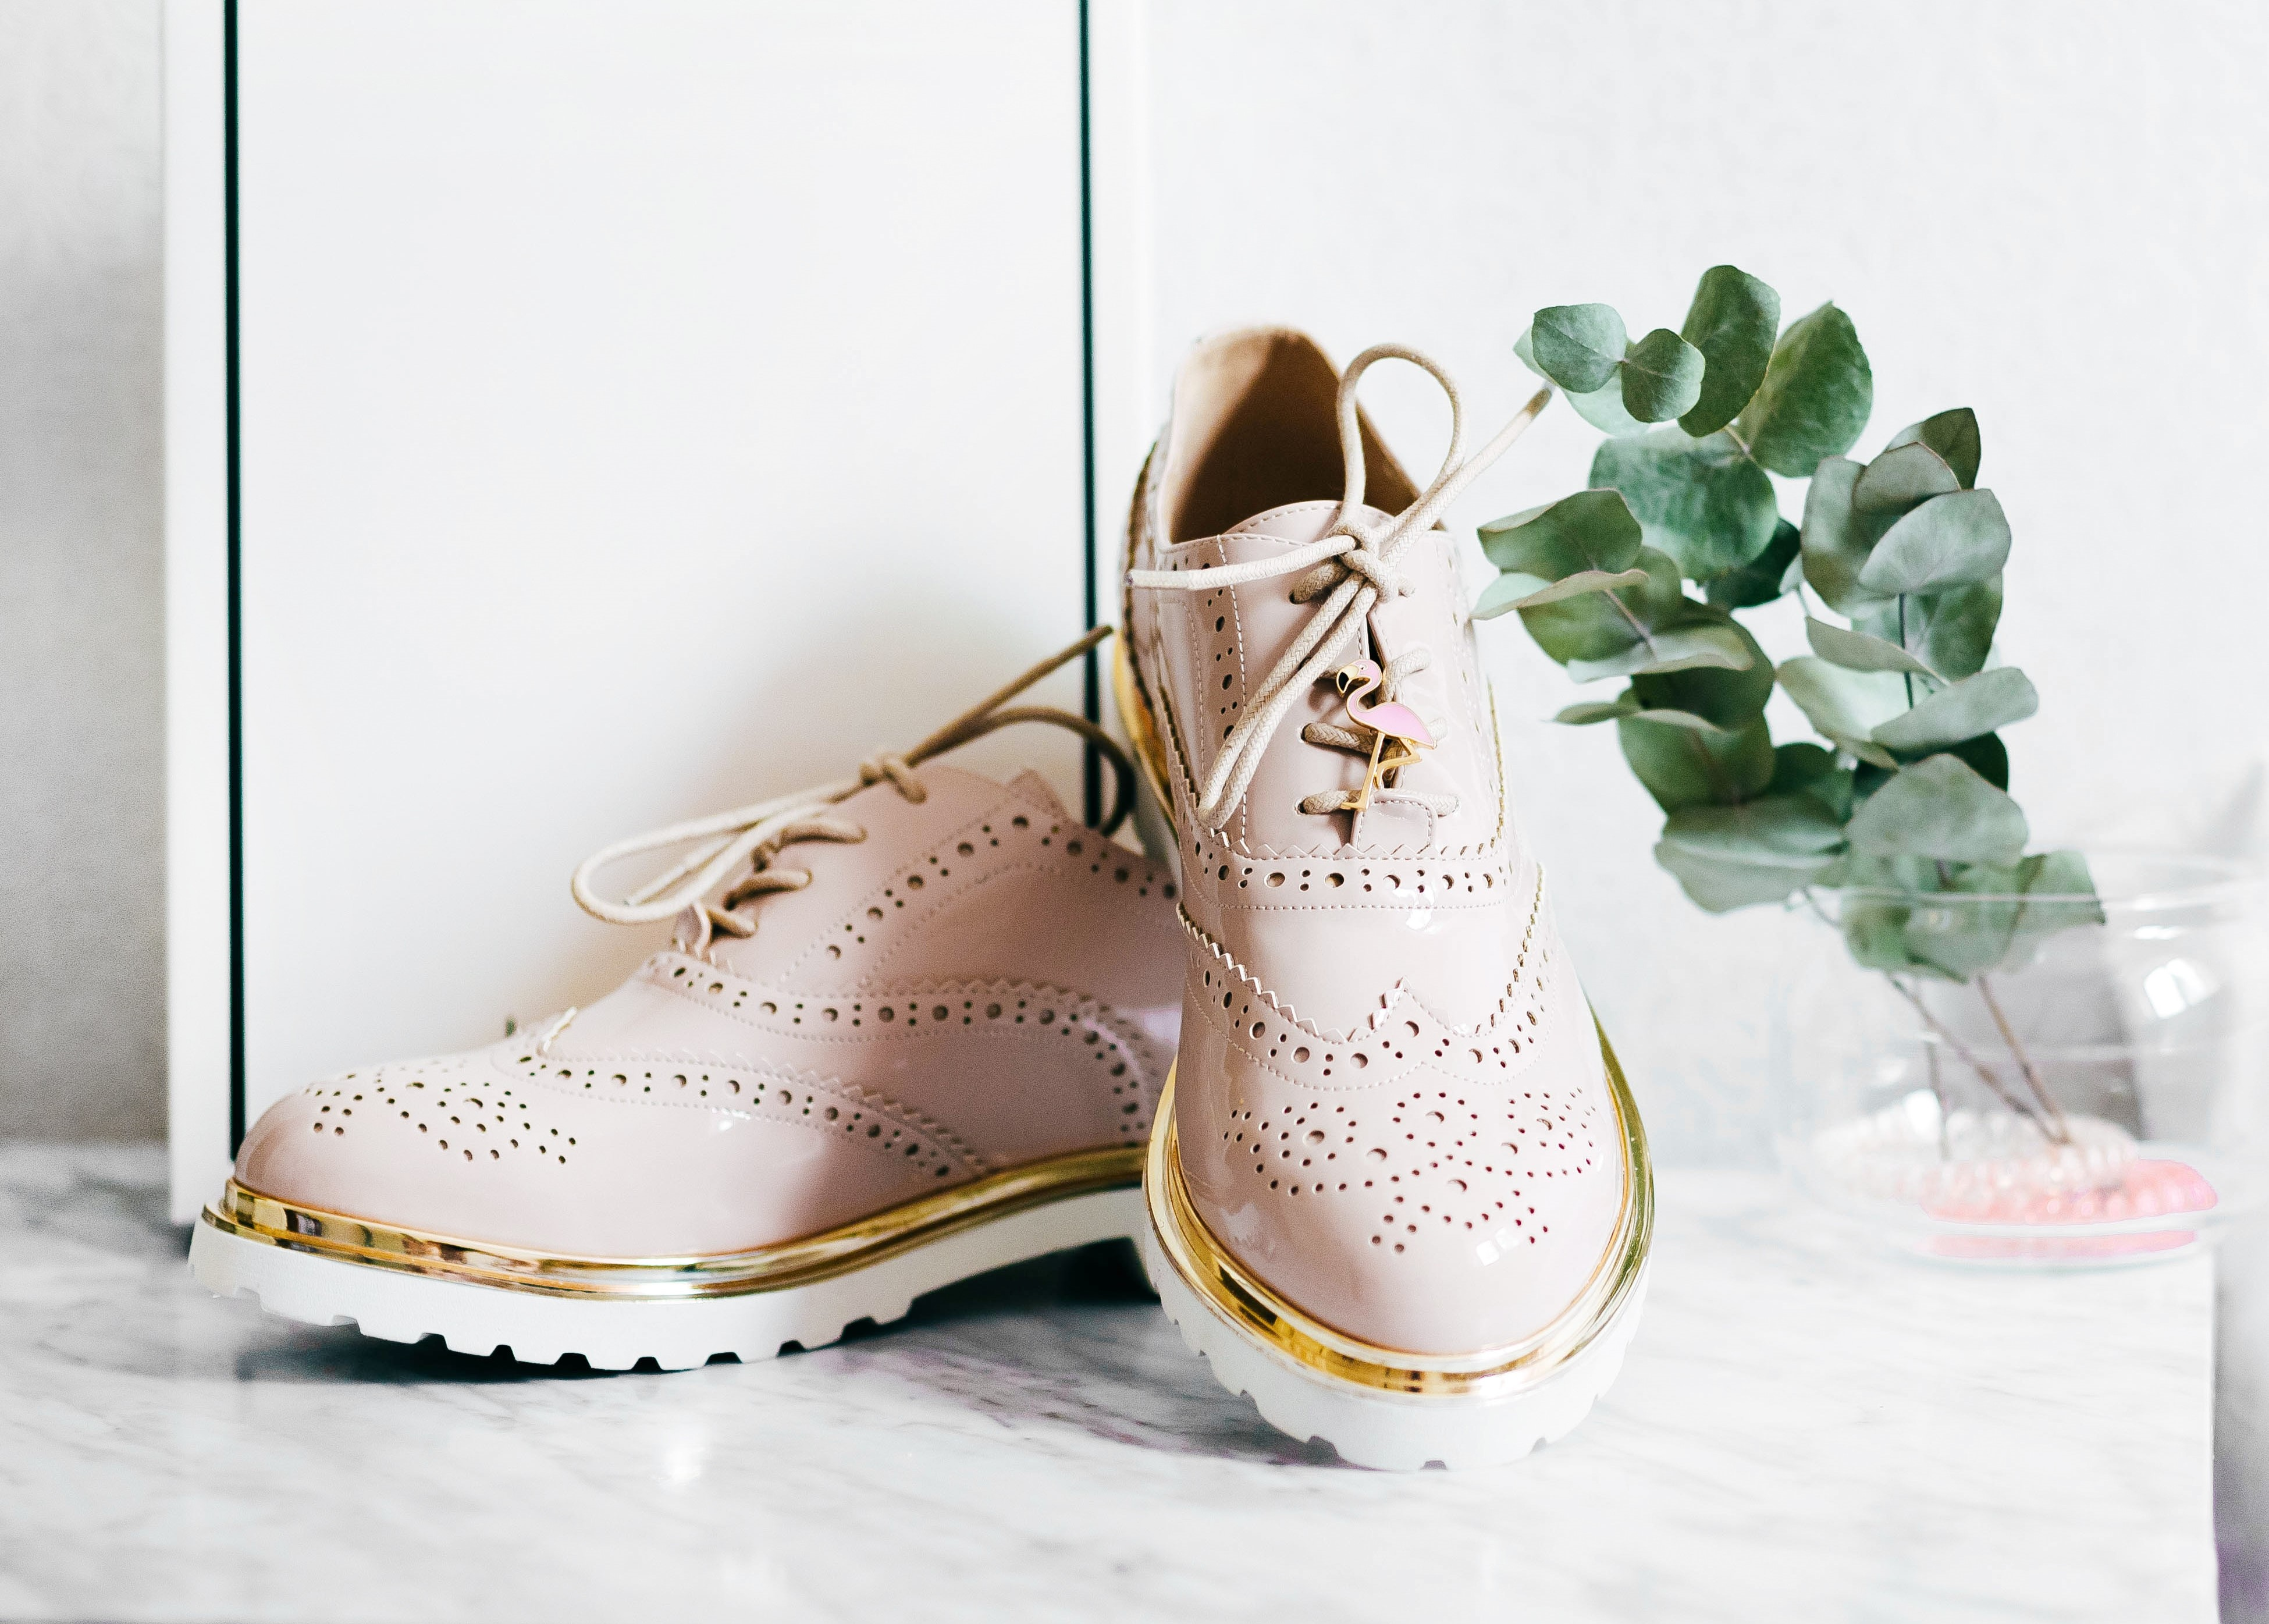 Stylish di Setiap Langkah dengan Sepatu Kasual Favorit Shopeeholics